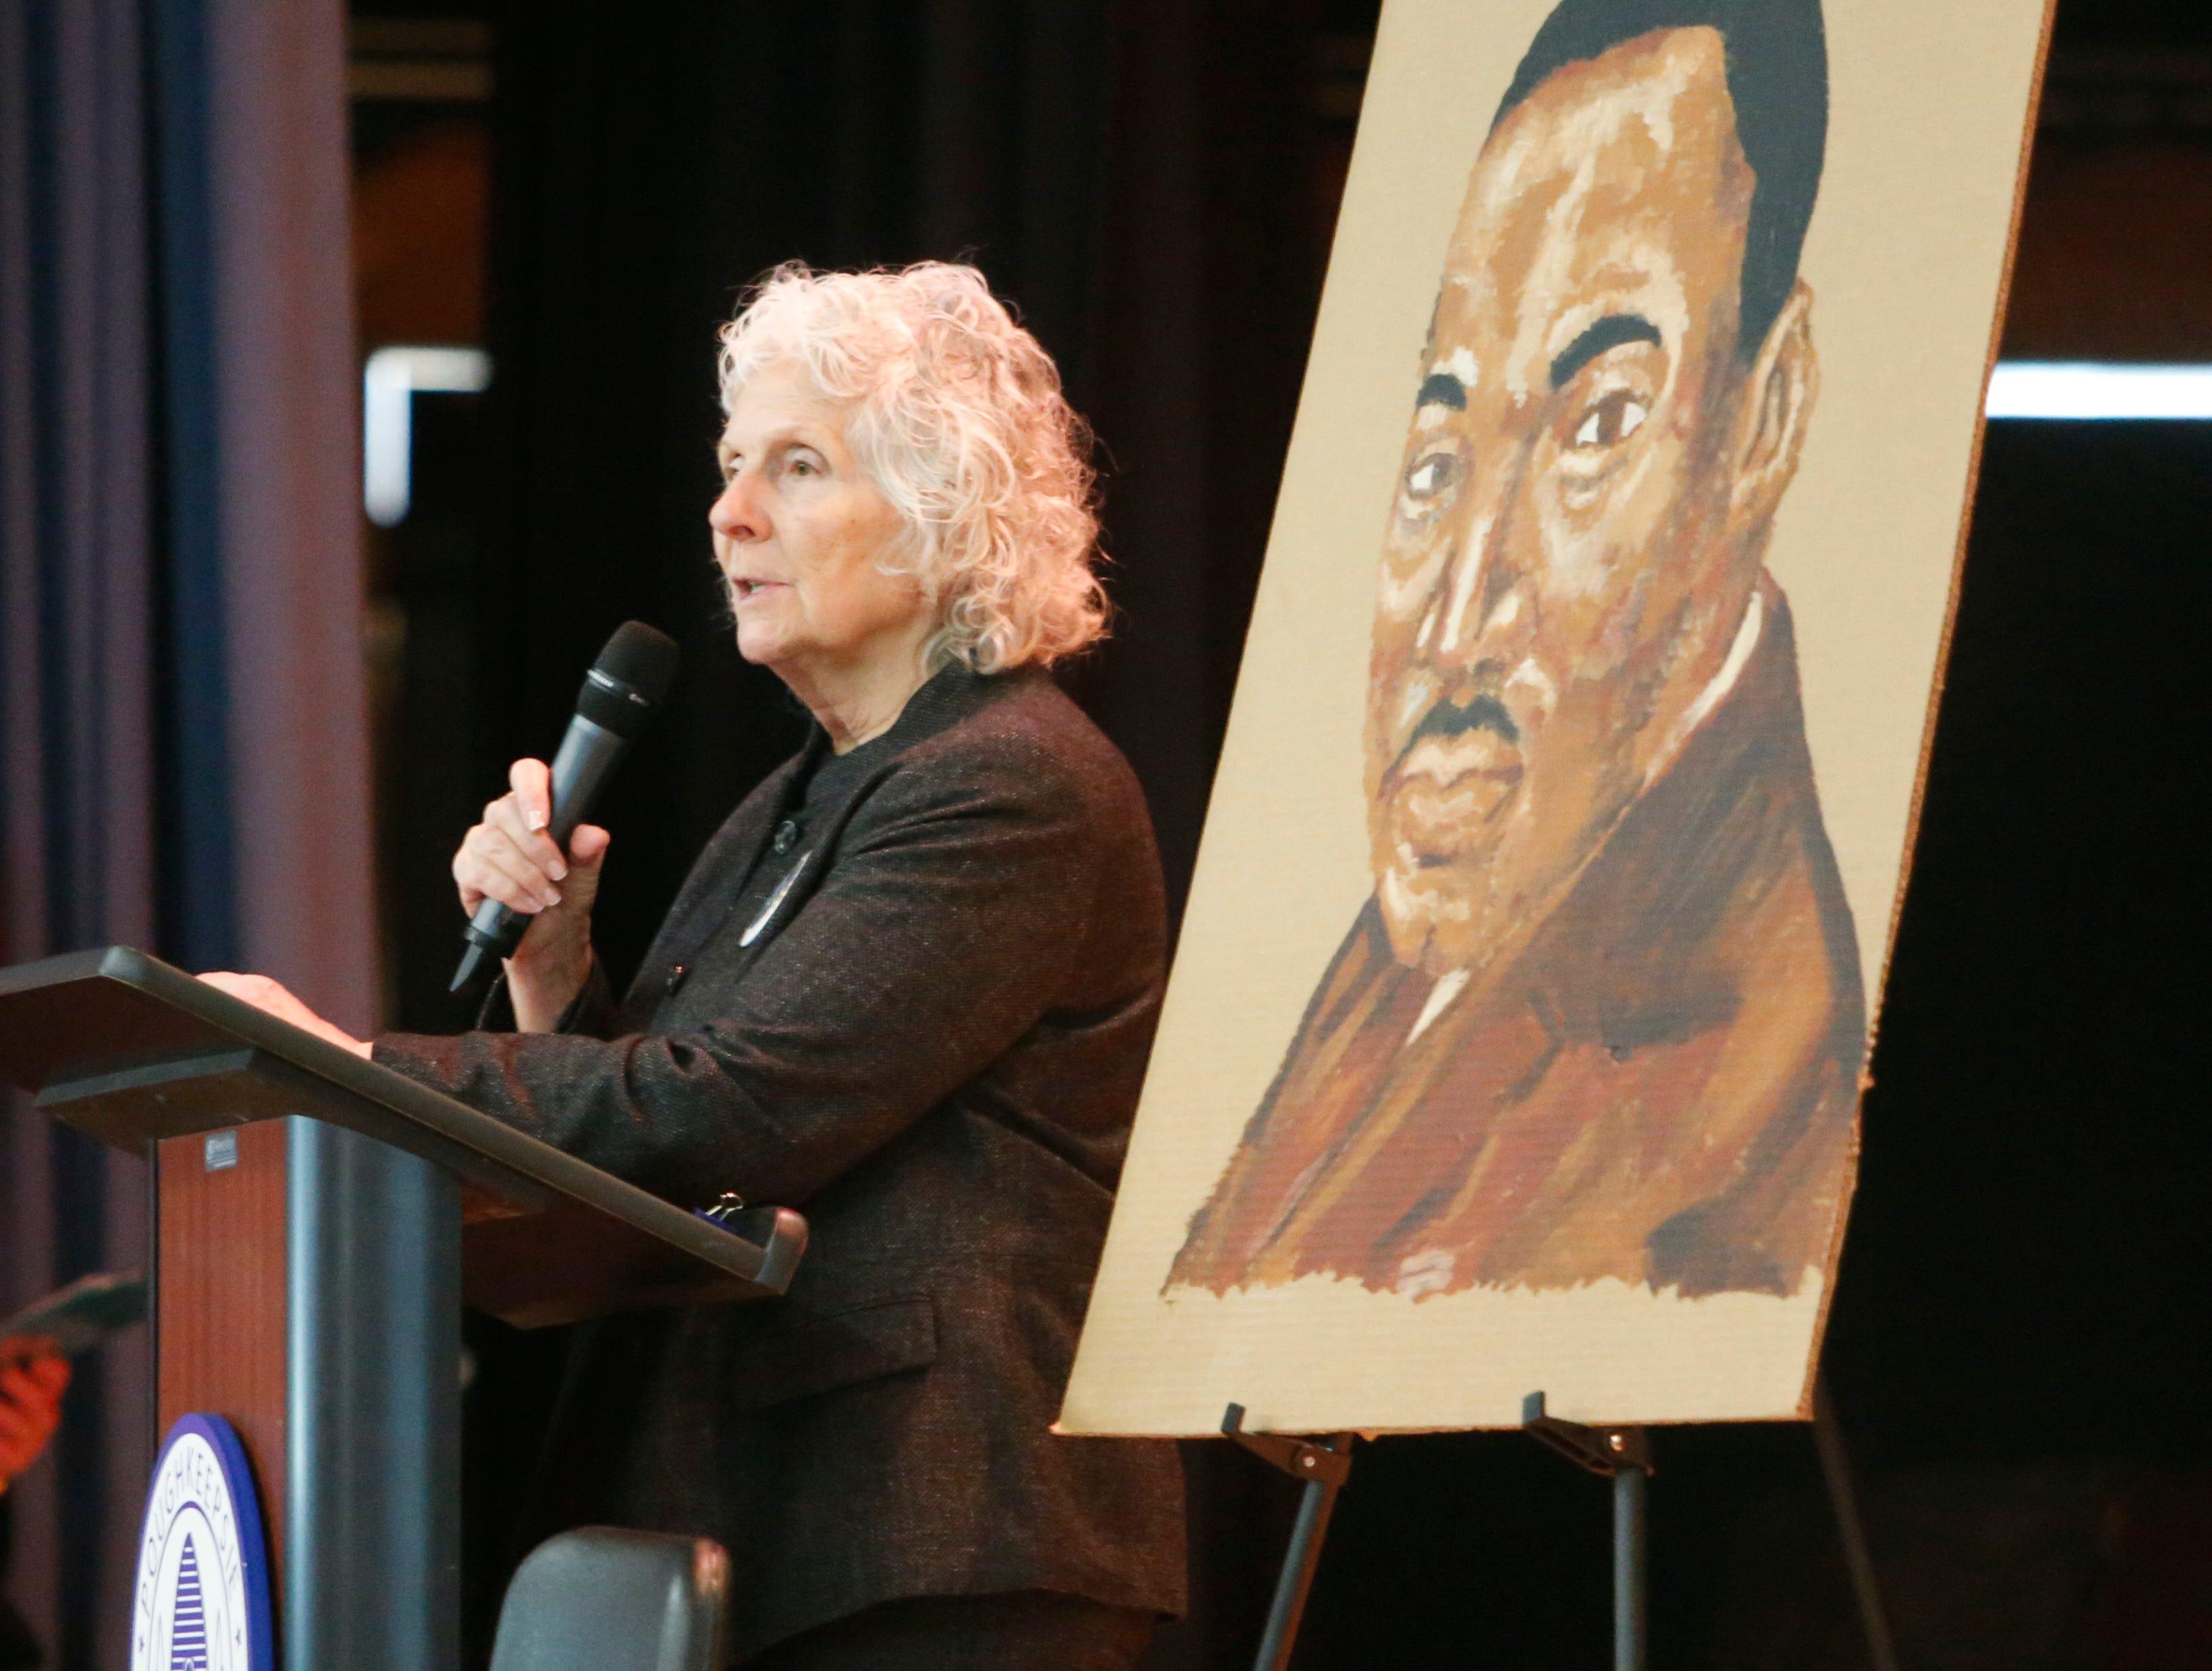 Poughkeepsie City School District interim superintendent, Kathleen Farrell speaks during Thursday's Martin Luther King Celebration at Poughkeepsie High School on February 14, 2019.